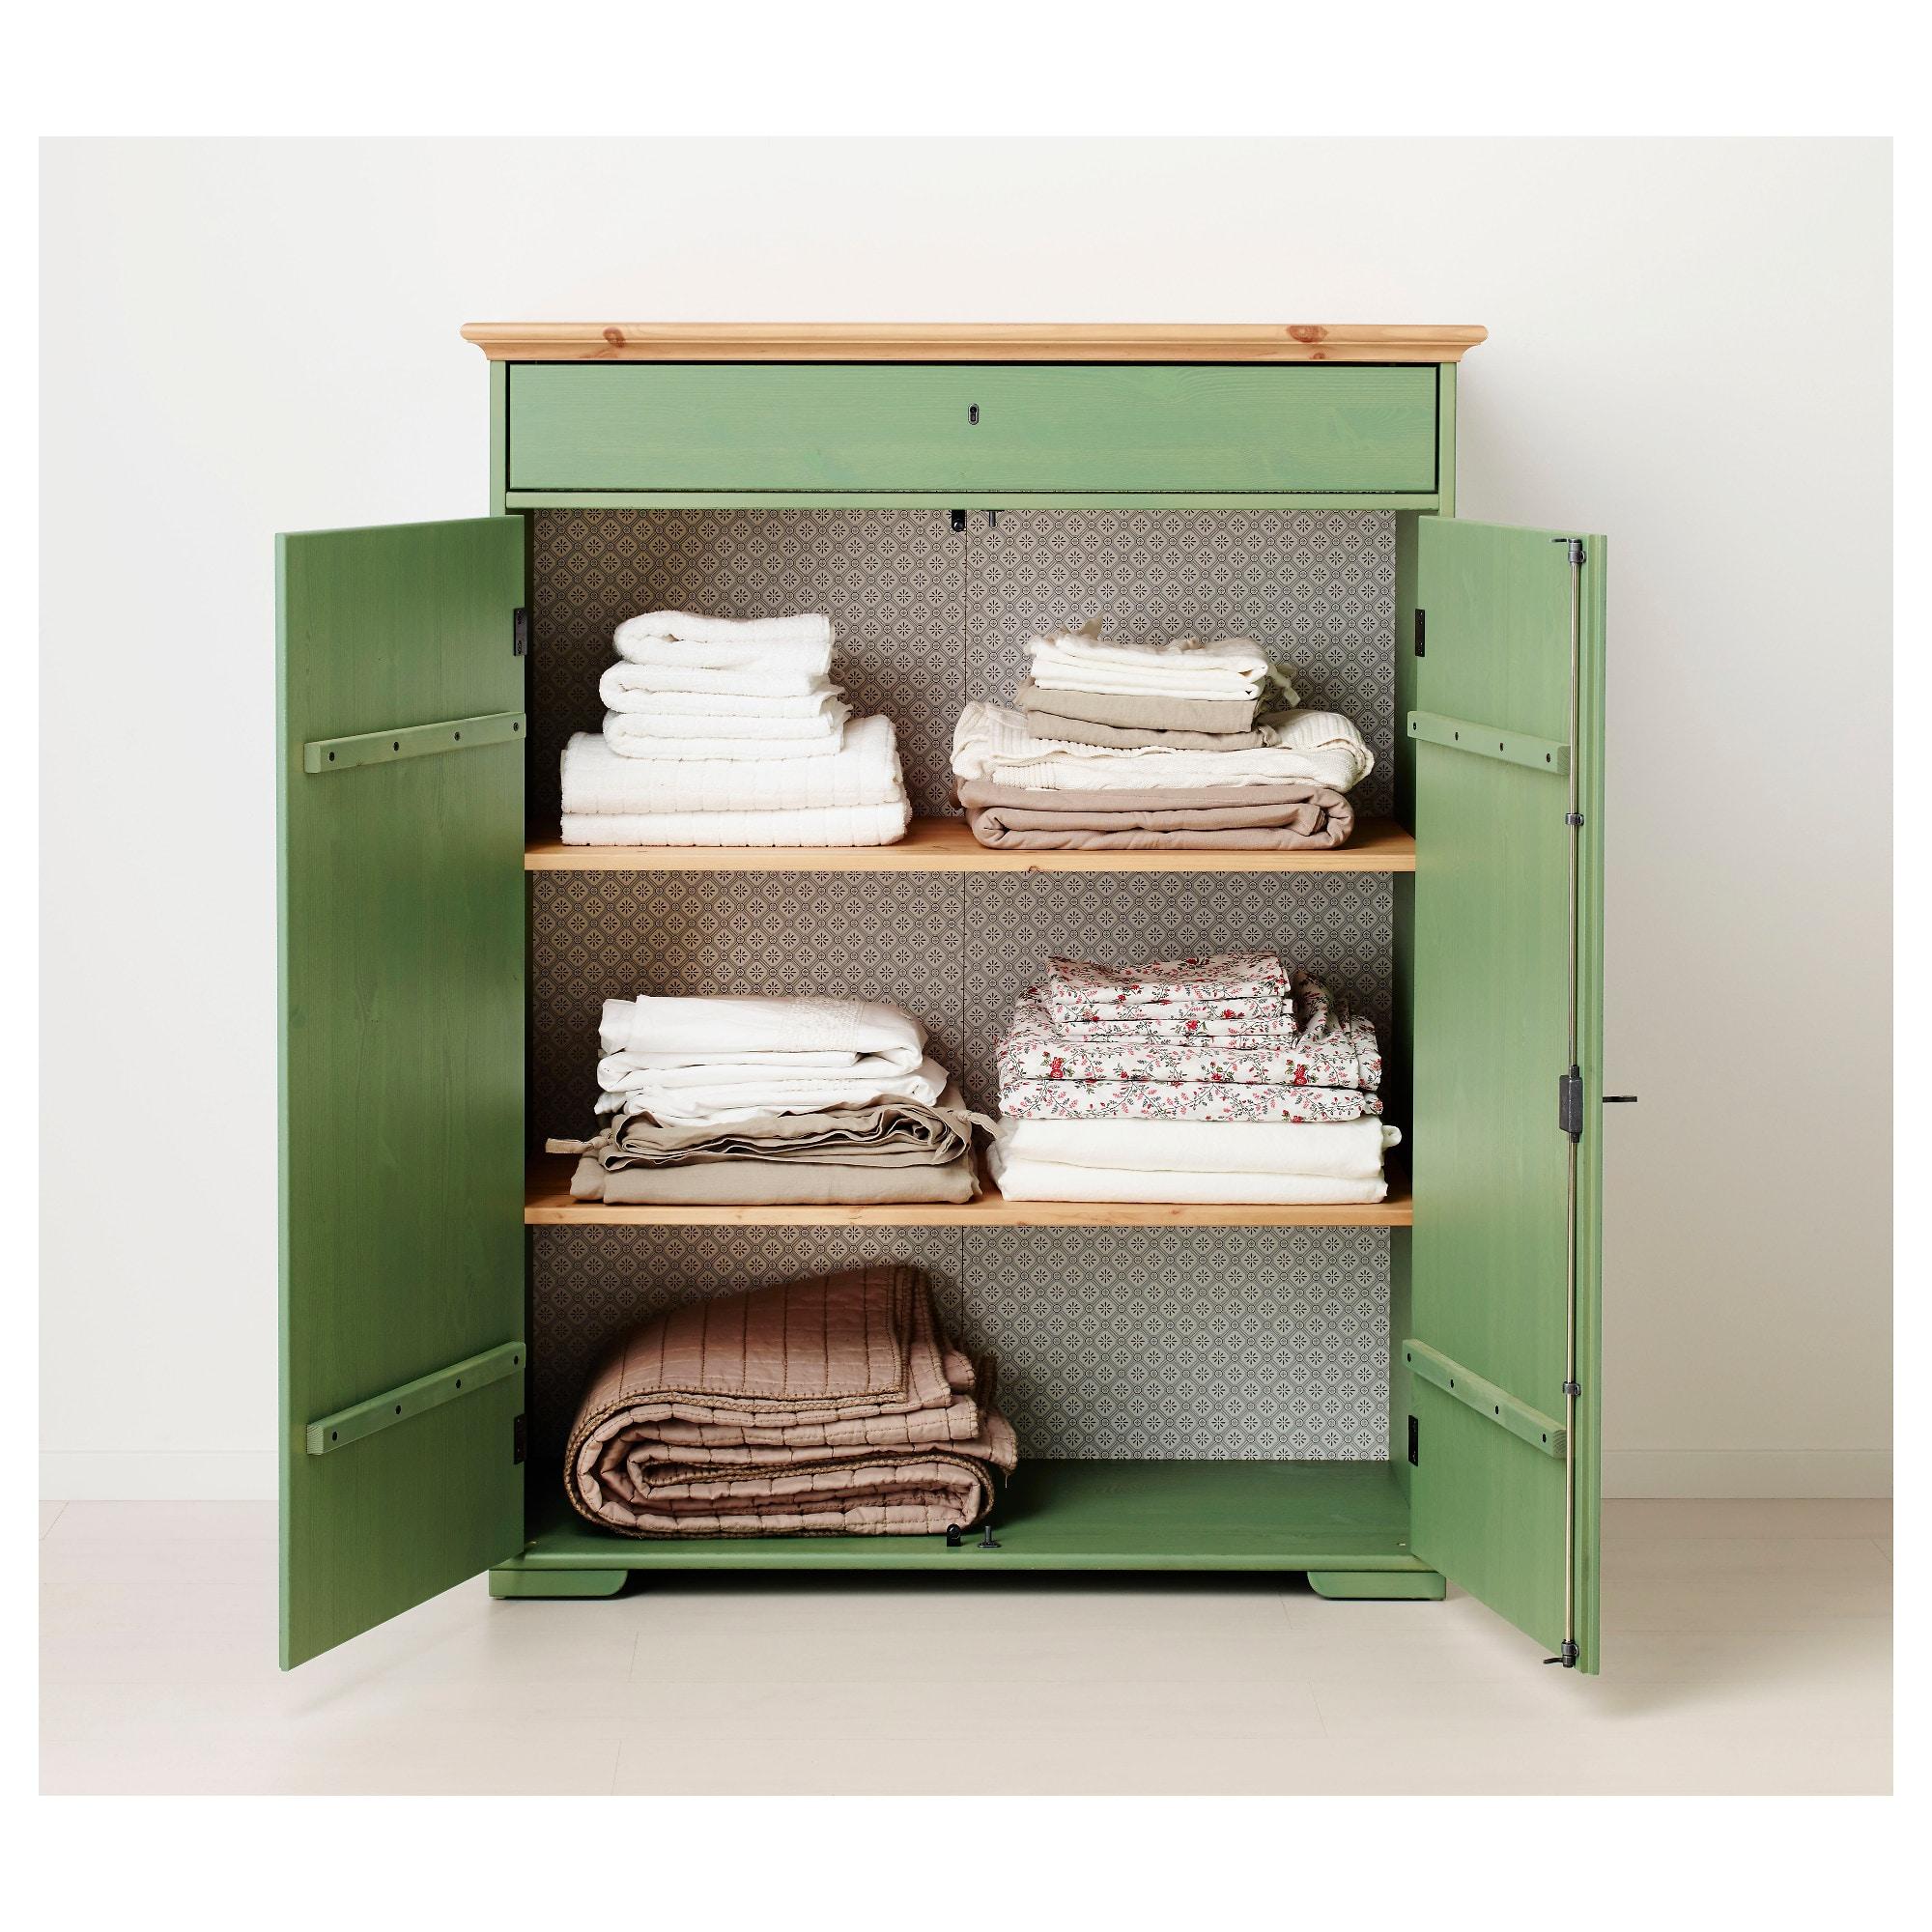 Image result for ikea linen cabinet   Linen cabinet, Ikea, Linen ...